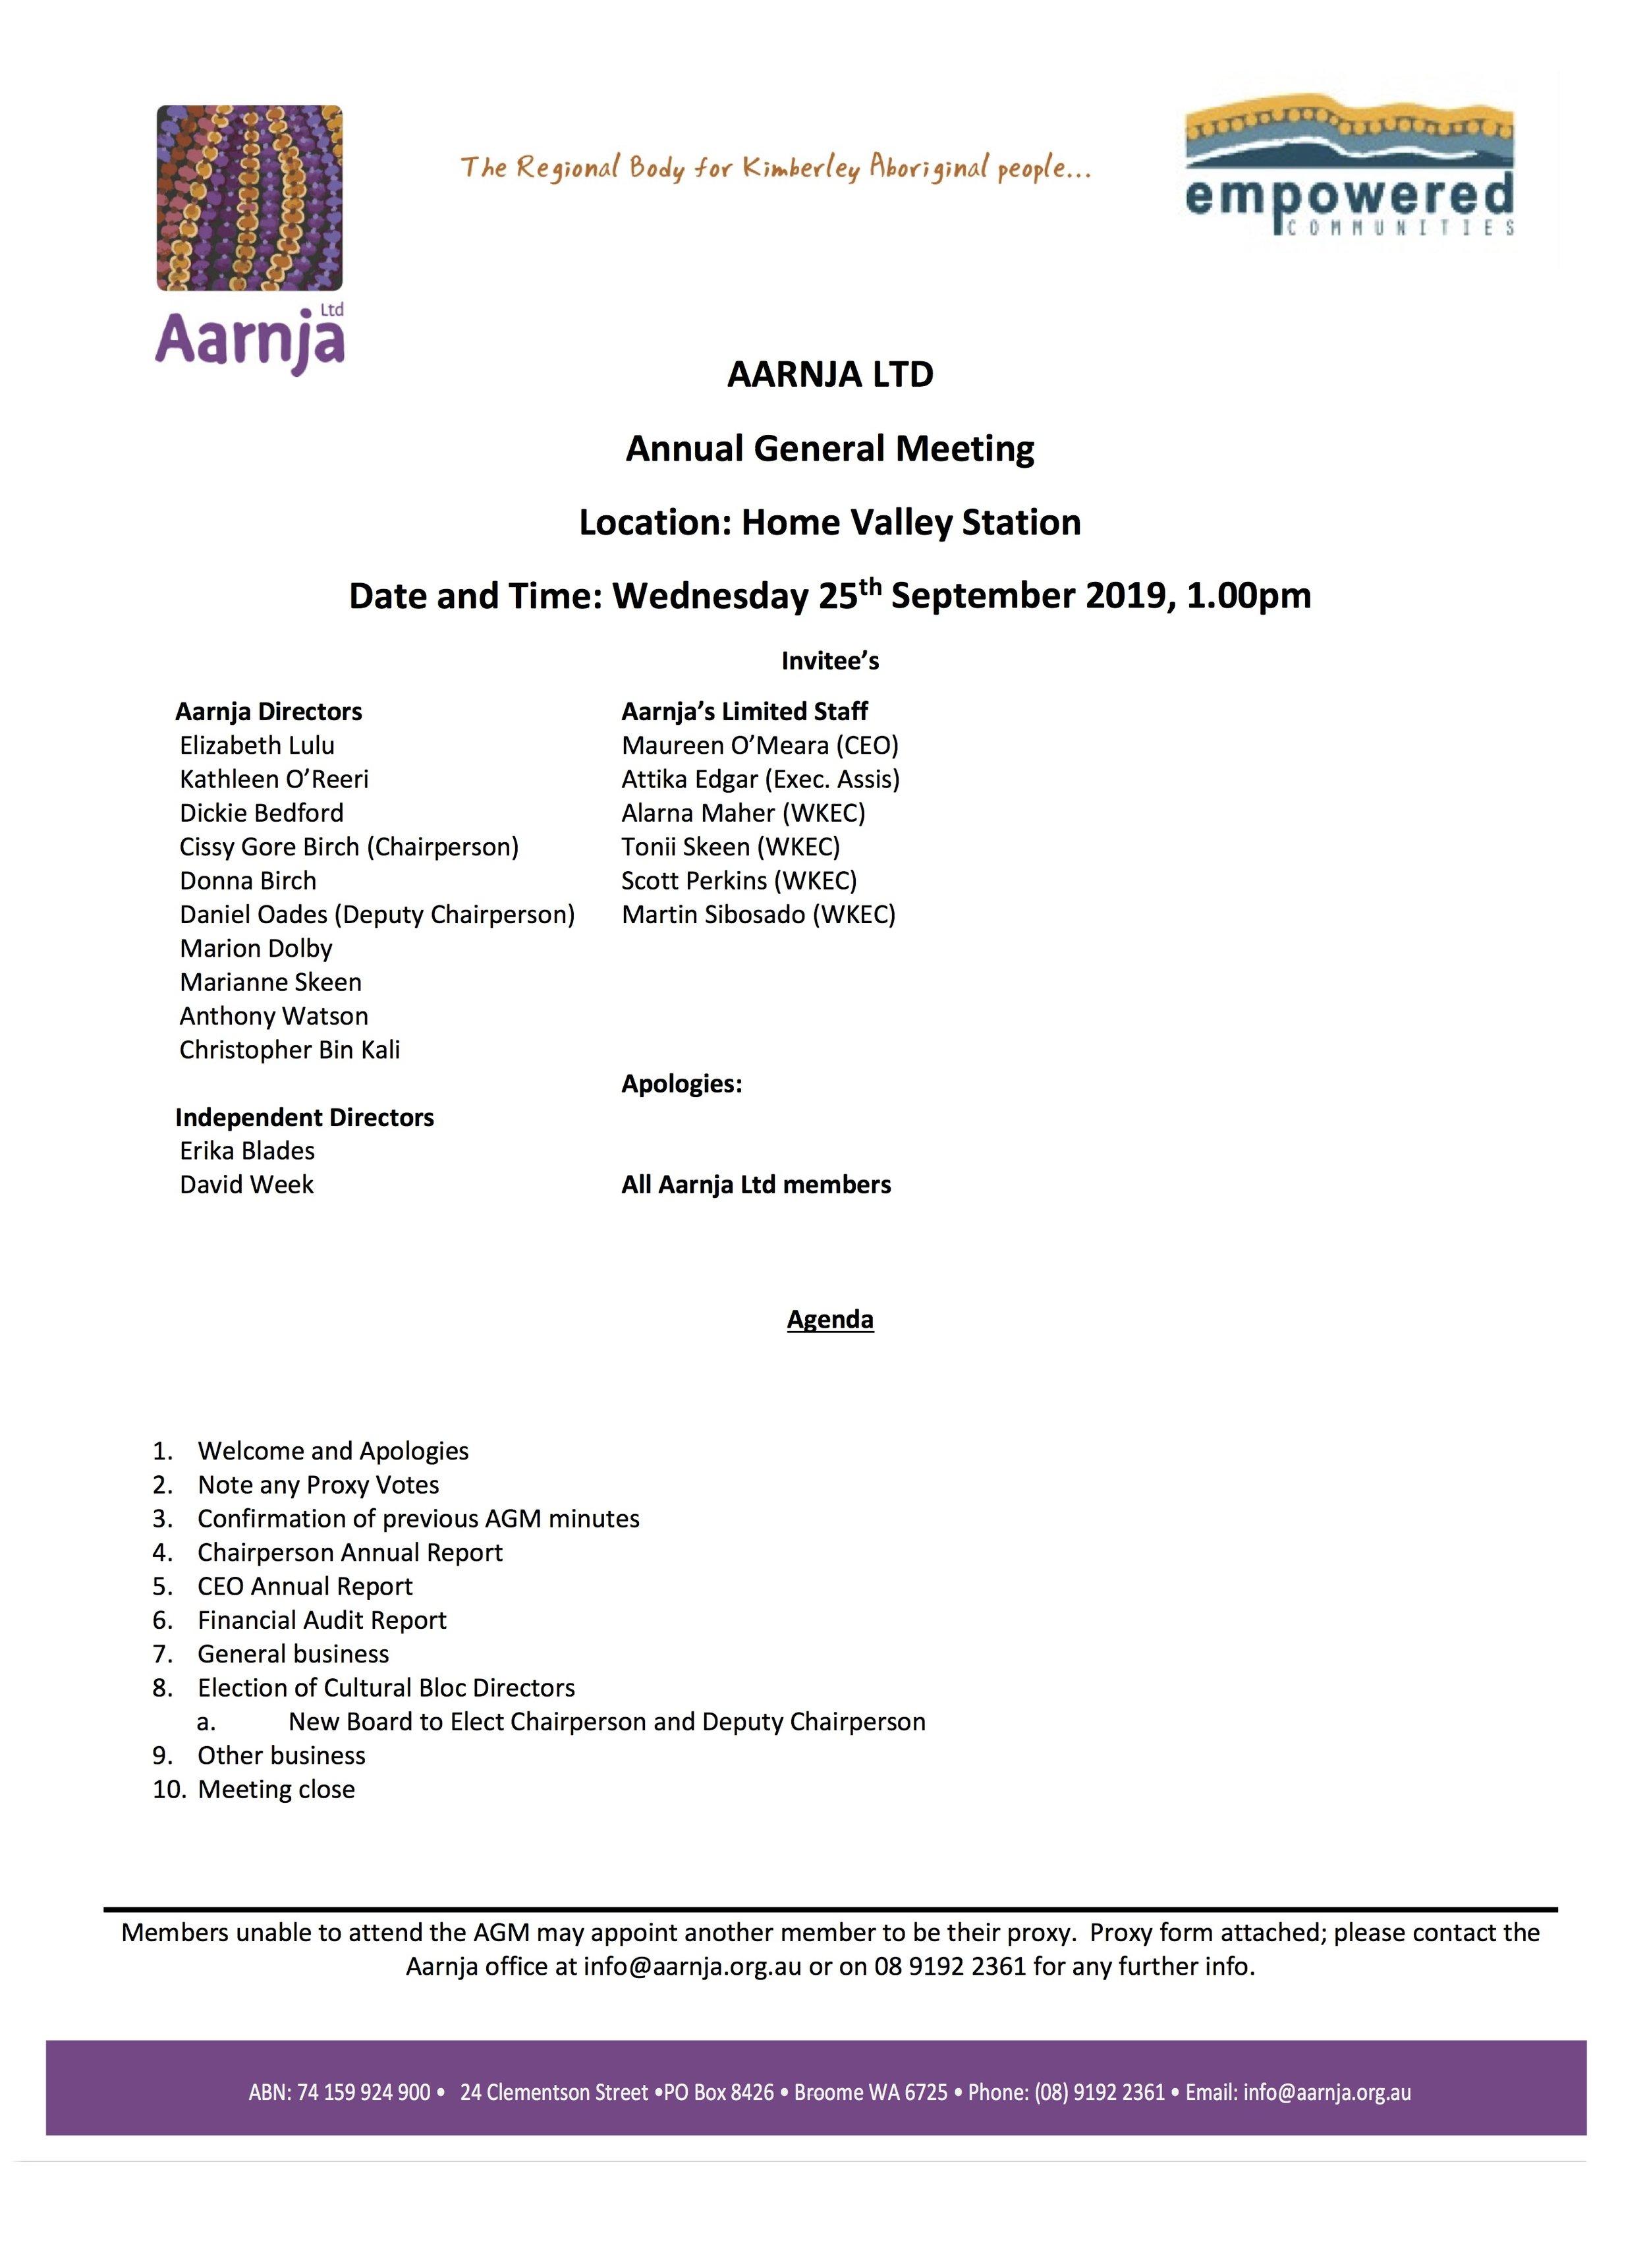 AGM Agenda 2019 - Final.jpg